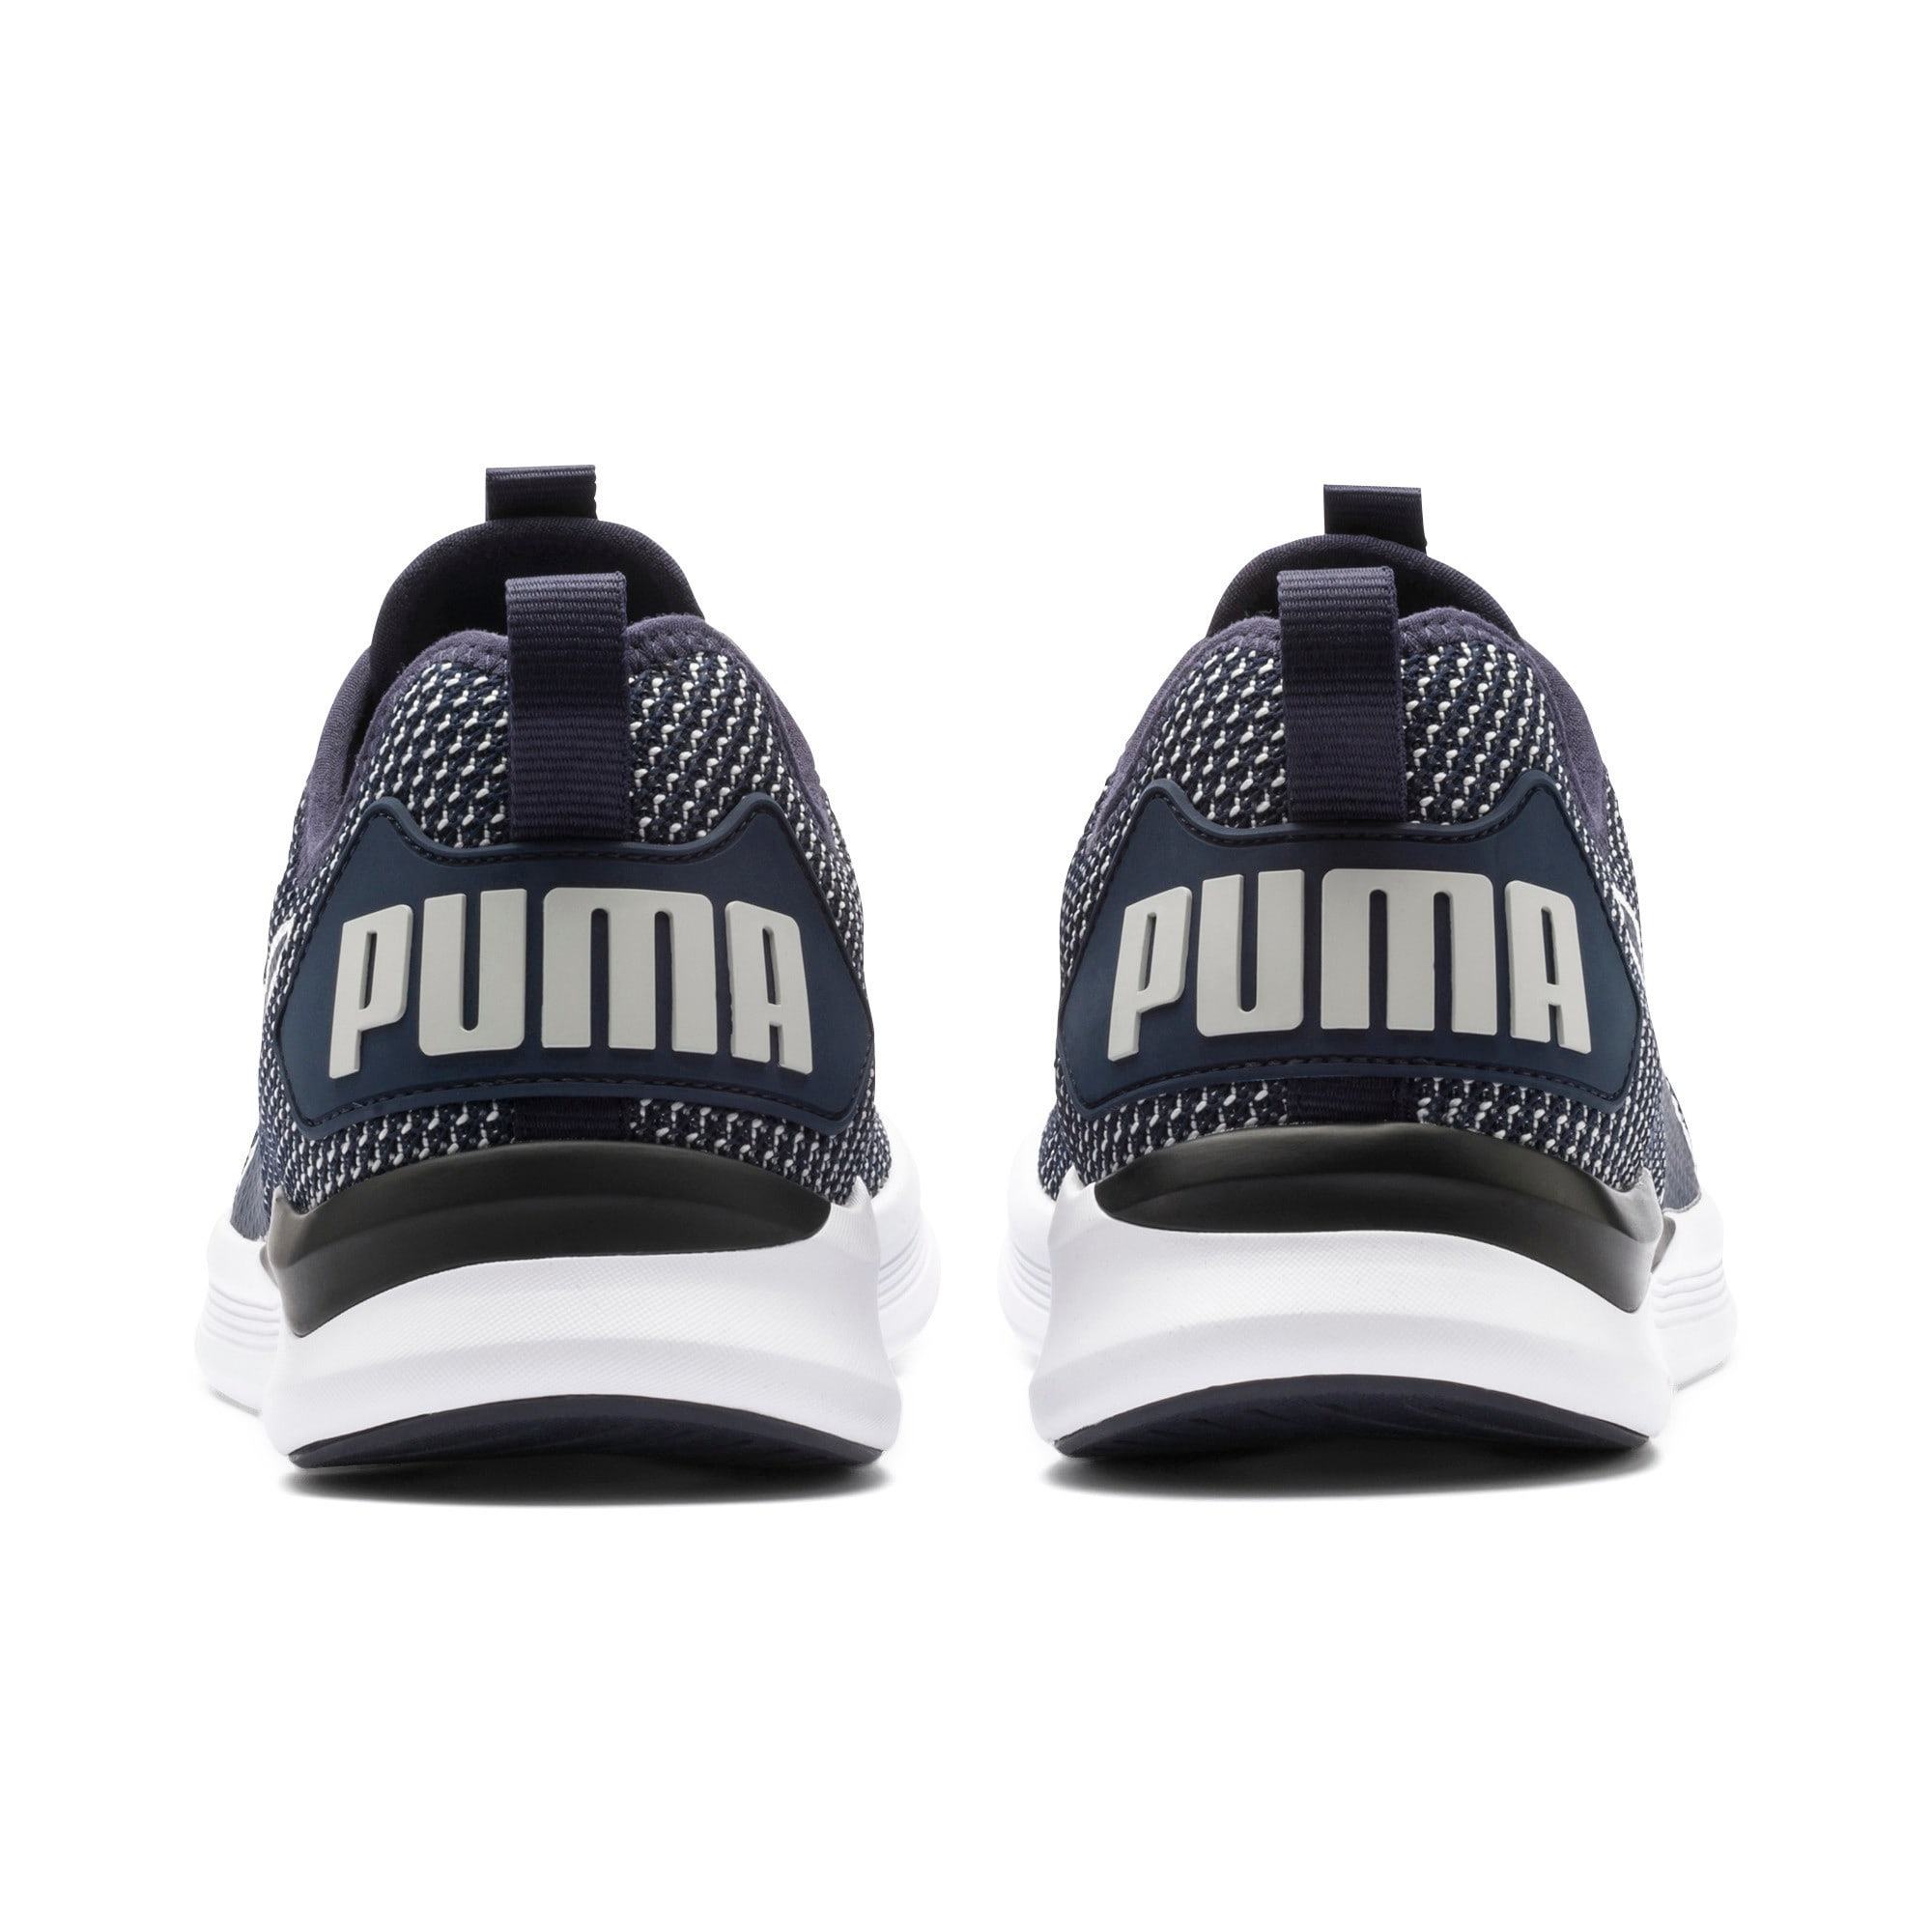 Thumbnail 6 of IGNITE Flash FS Men's Running Shoes, Peacoat-Glacier Gray-White, medium-IND